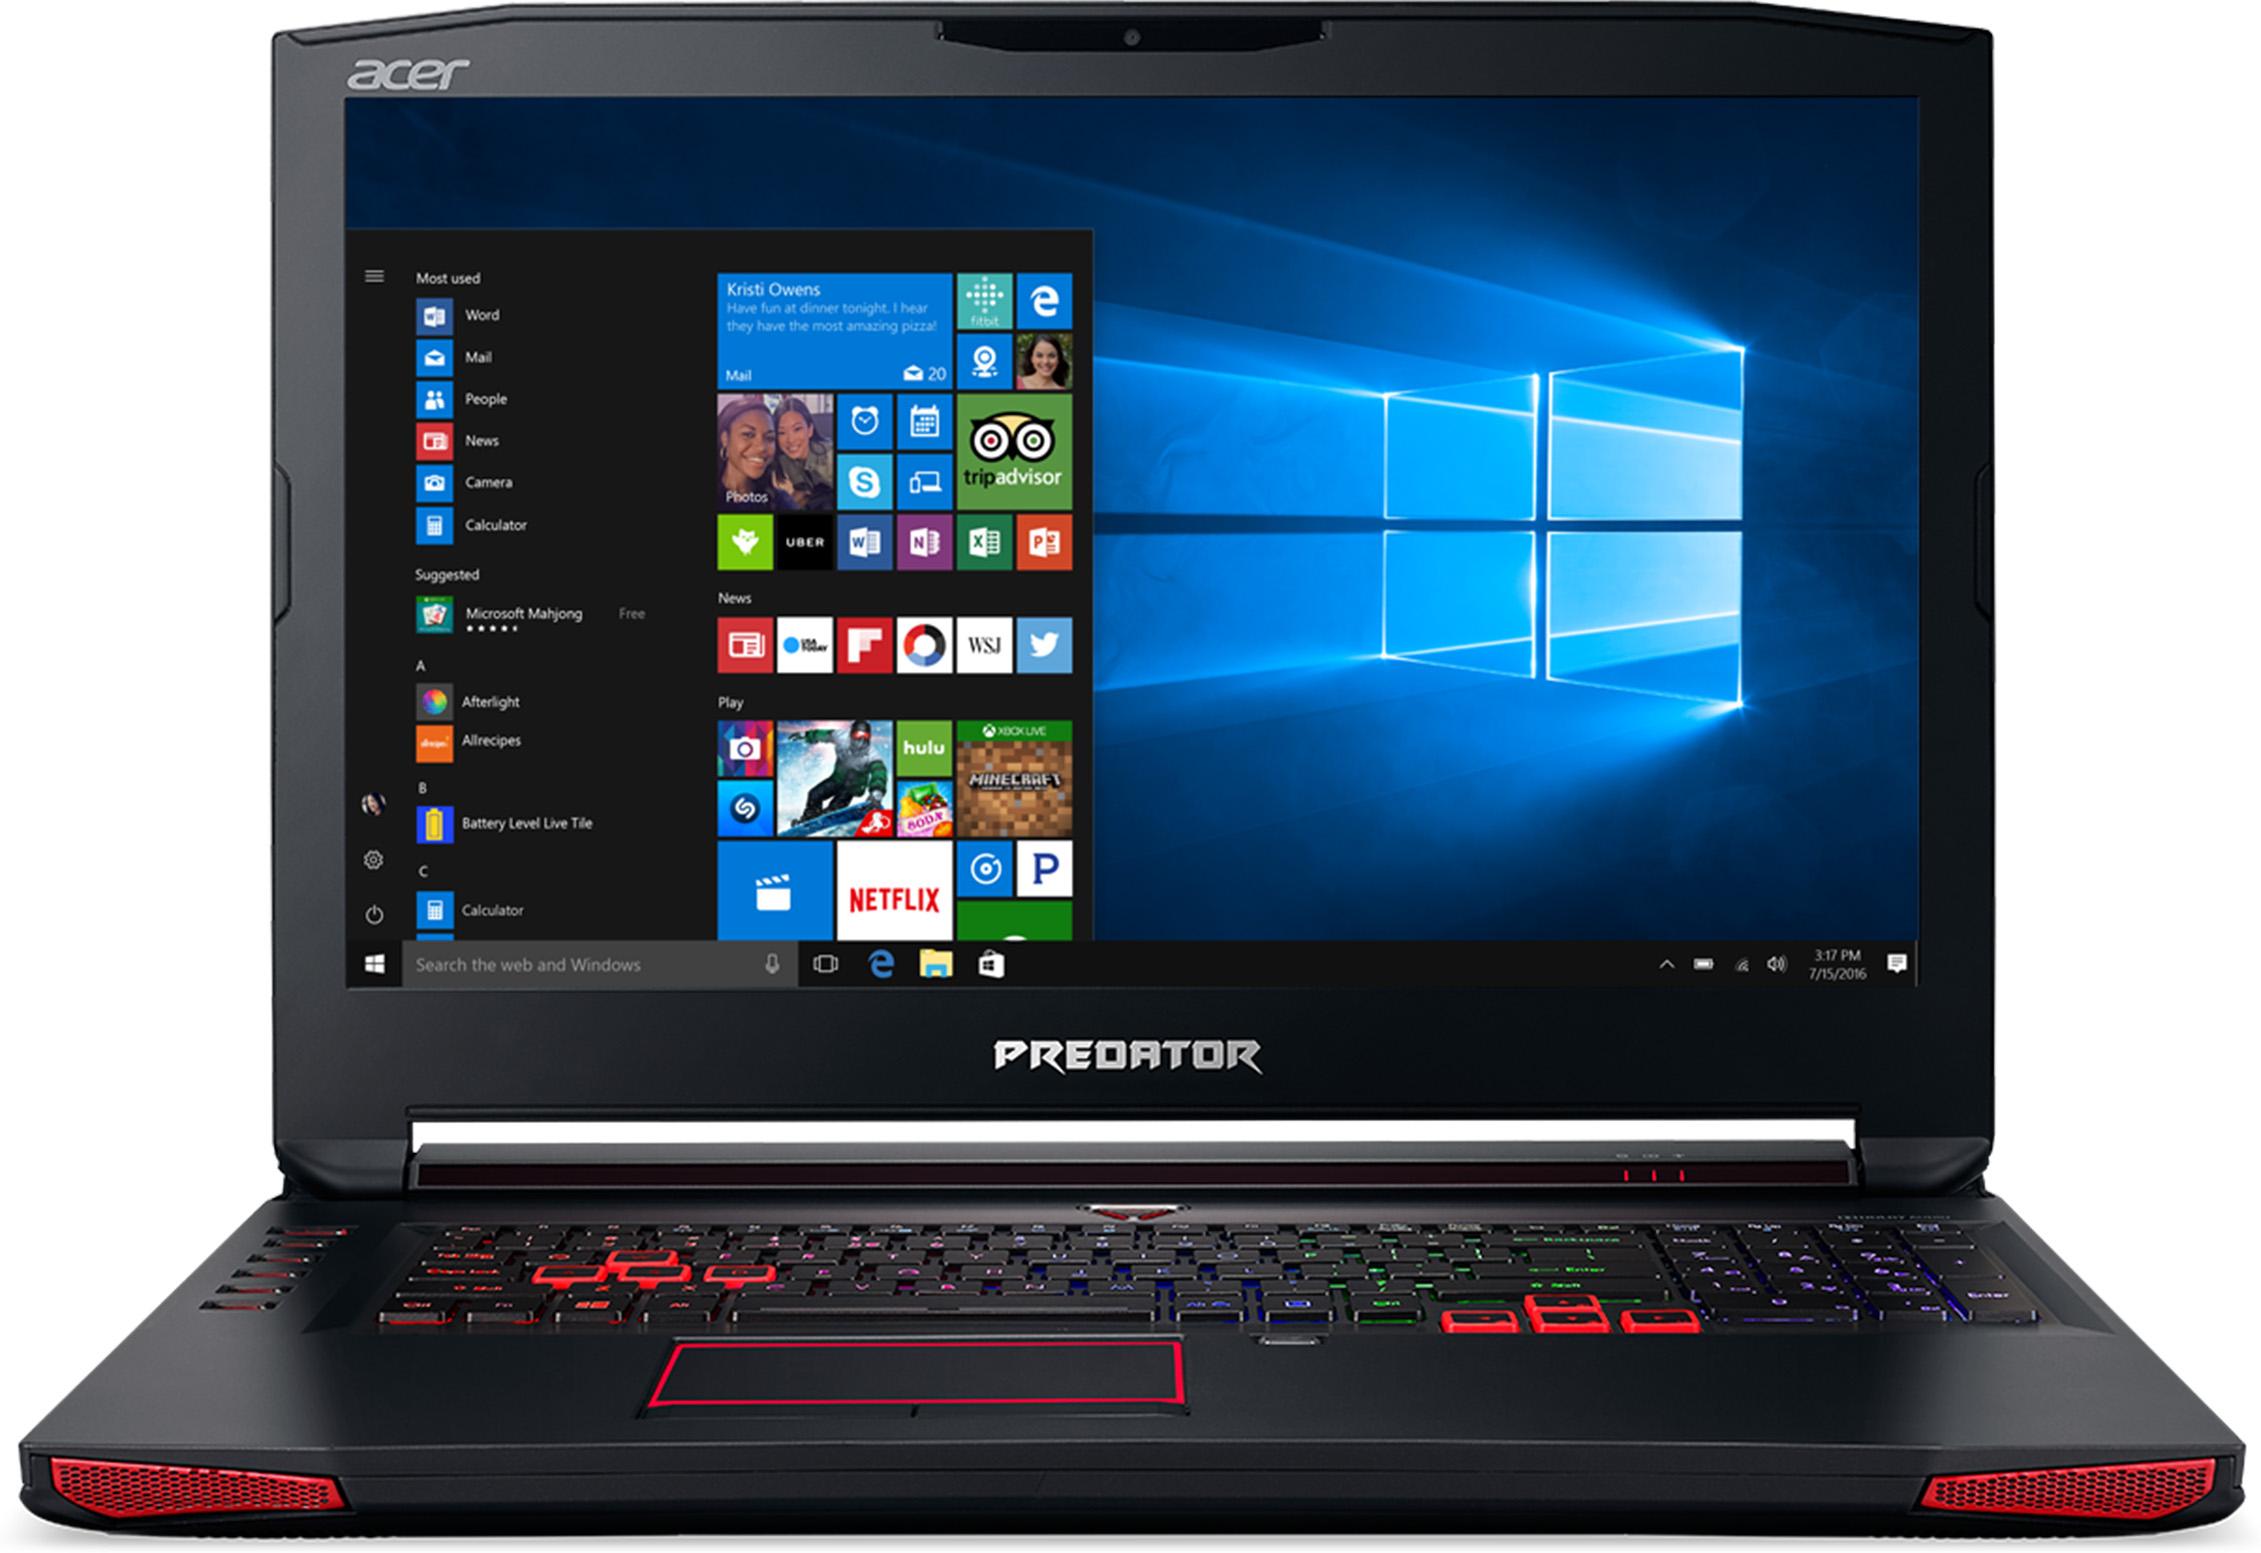 Acer Predator 17 G9-793-76KV Signature Edition Gaming Laptop Deal